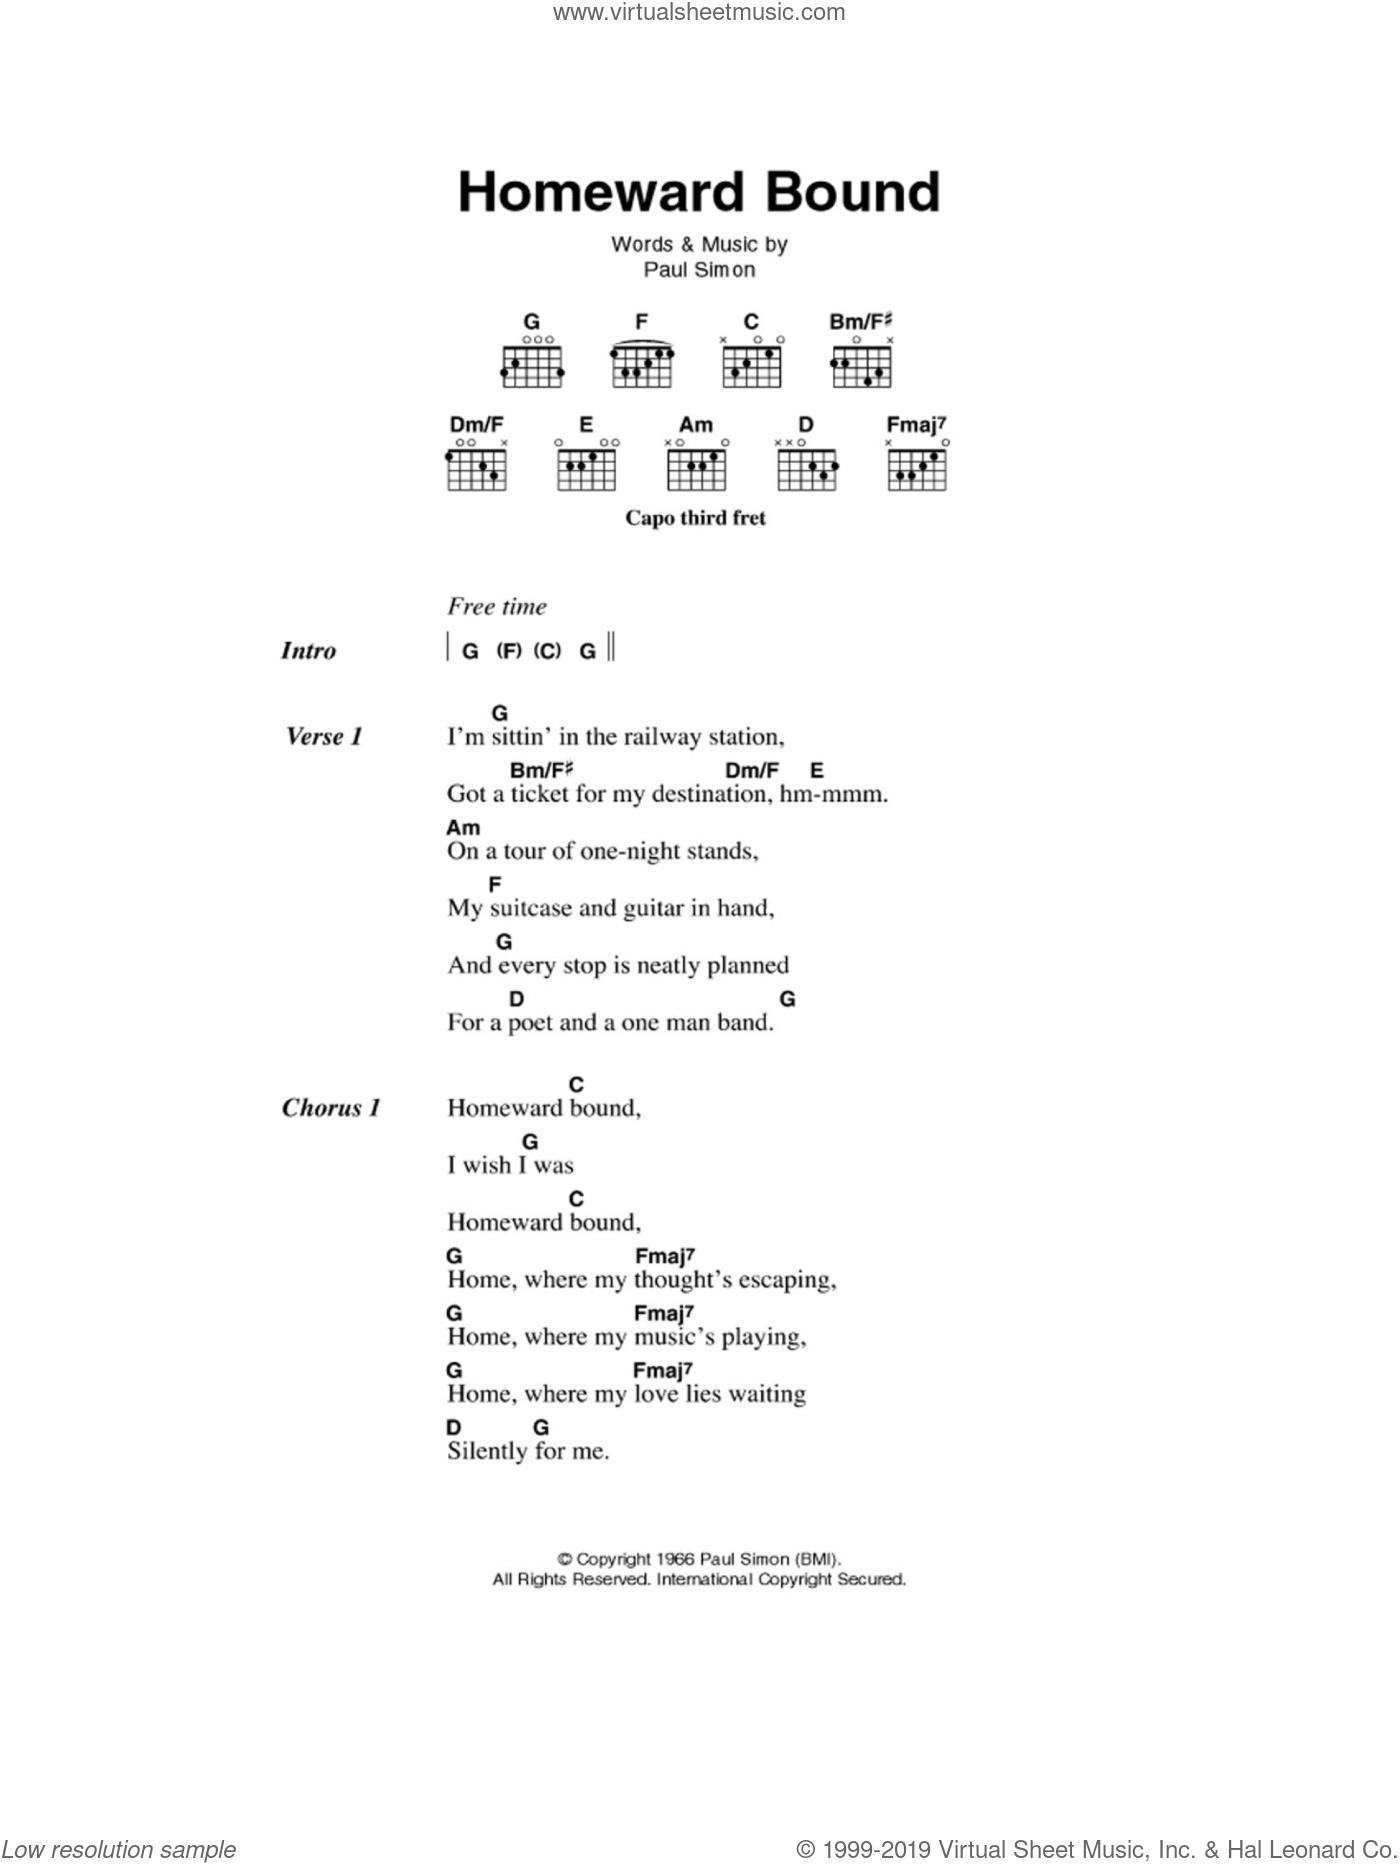 Garfunkel   Homeward Bound sheet music for guitar chords v15